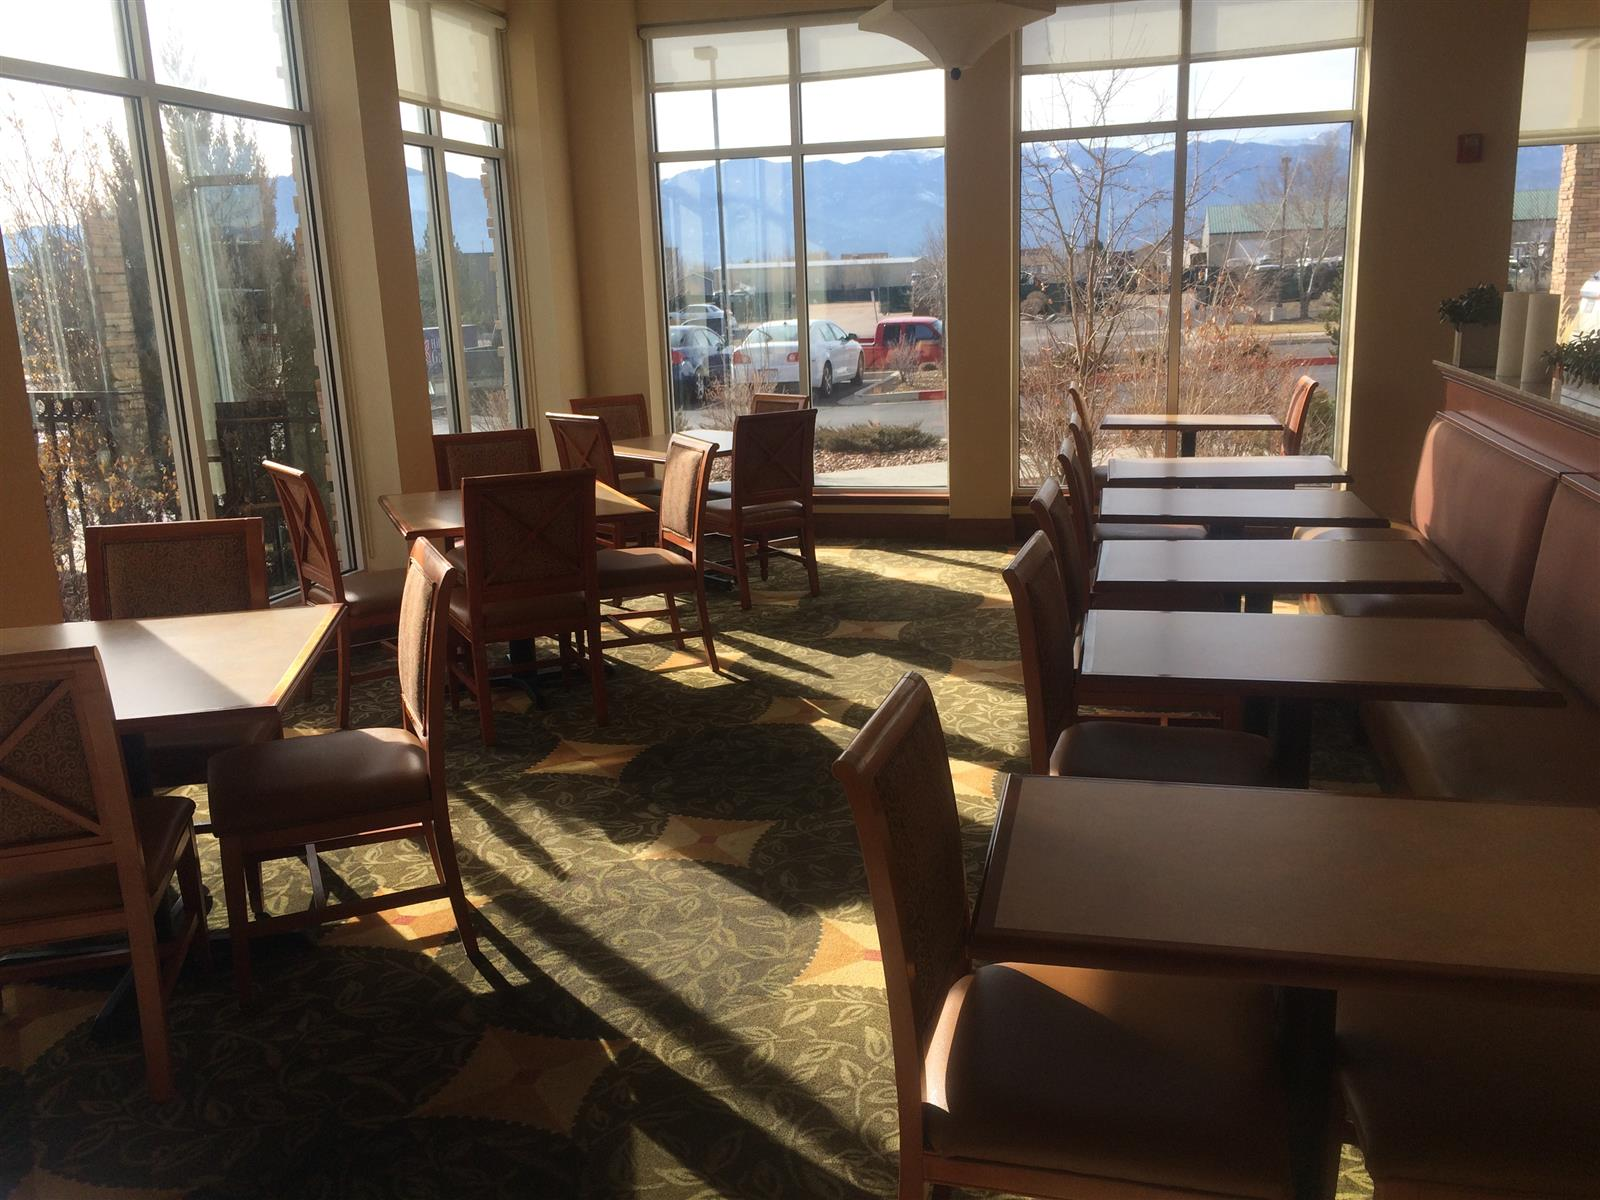 Hilton Garden Inn Colorado Springs Airport - Lobby Atrium - Space 3